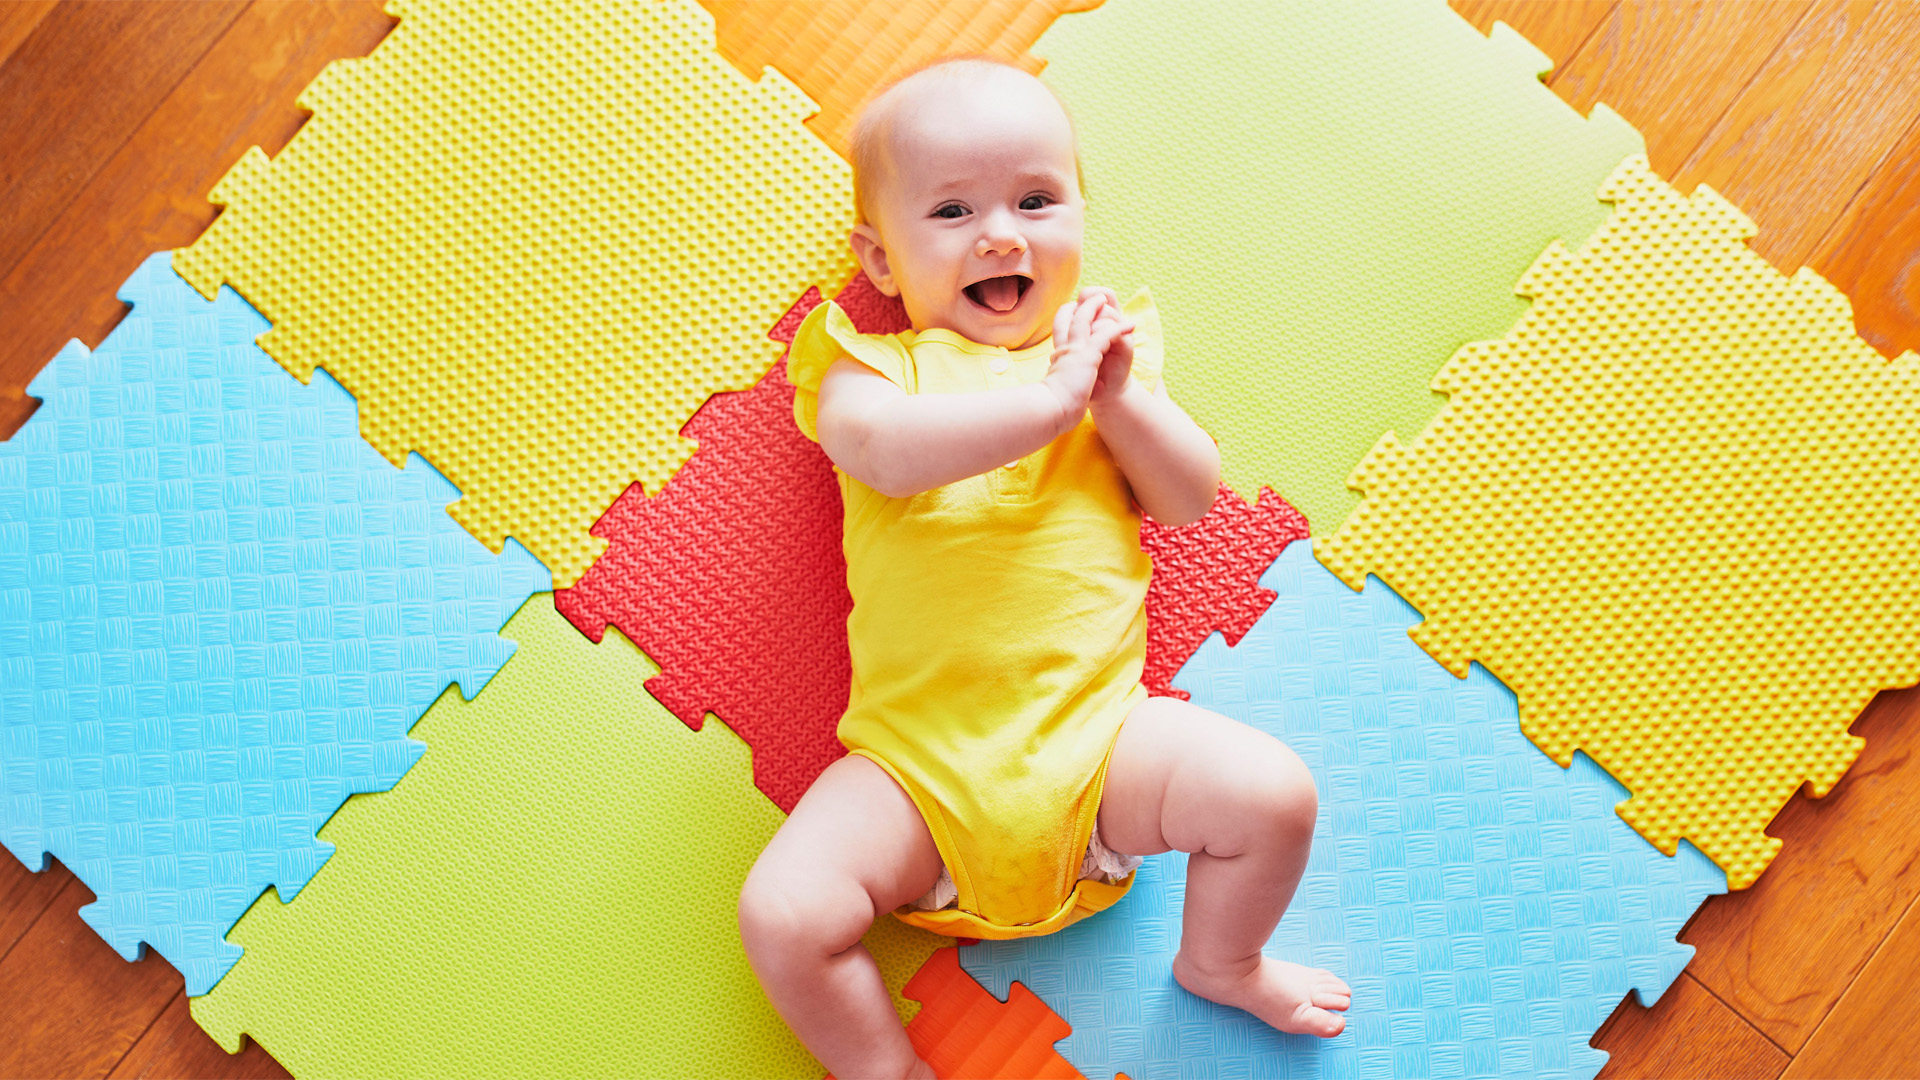 TermehKids 17 1 - آموزش رنگها به کودکان با فرش بازی